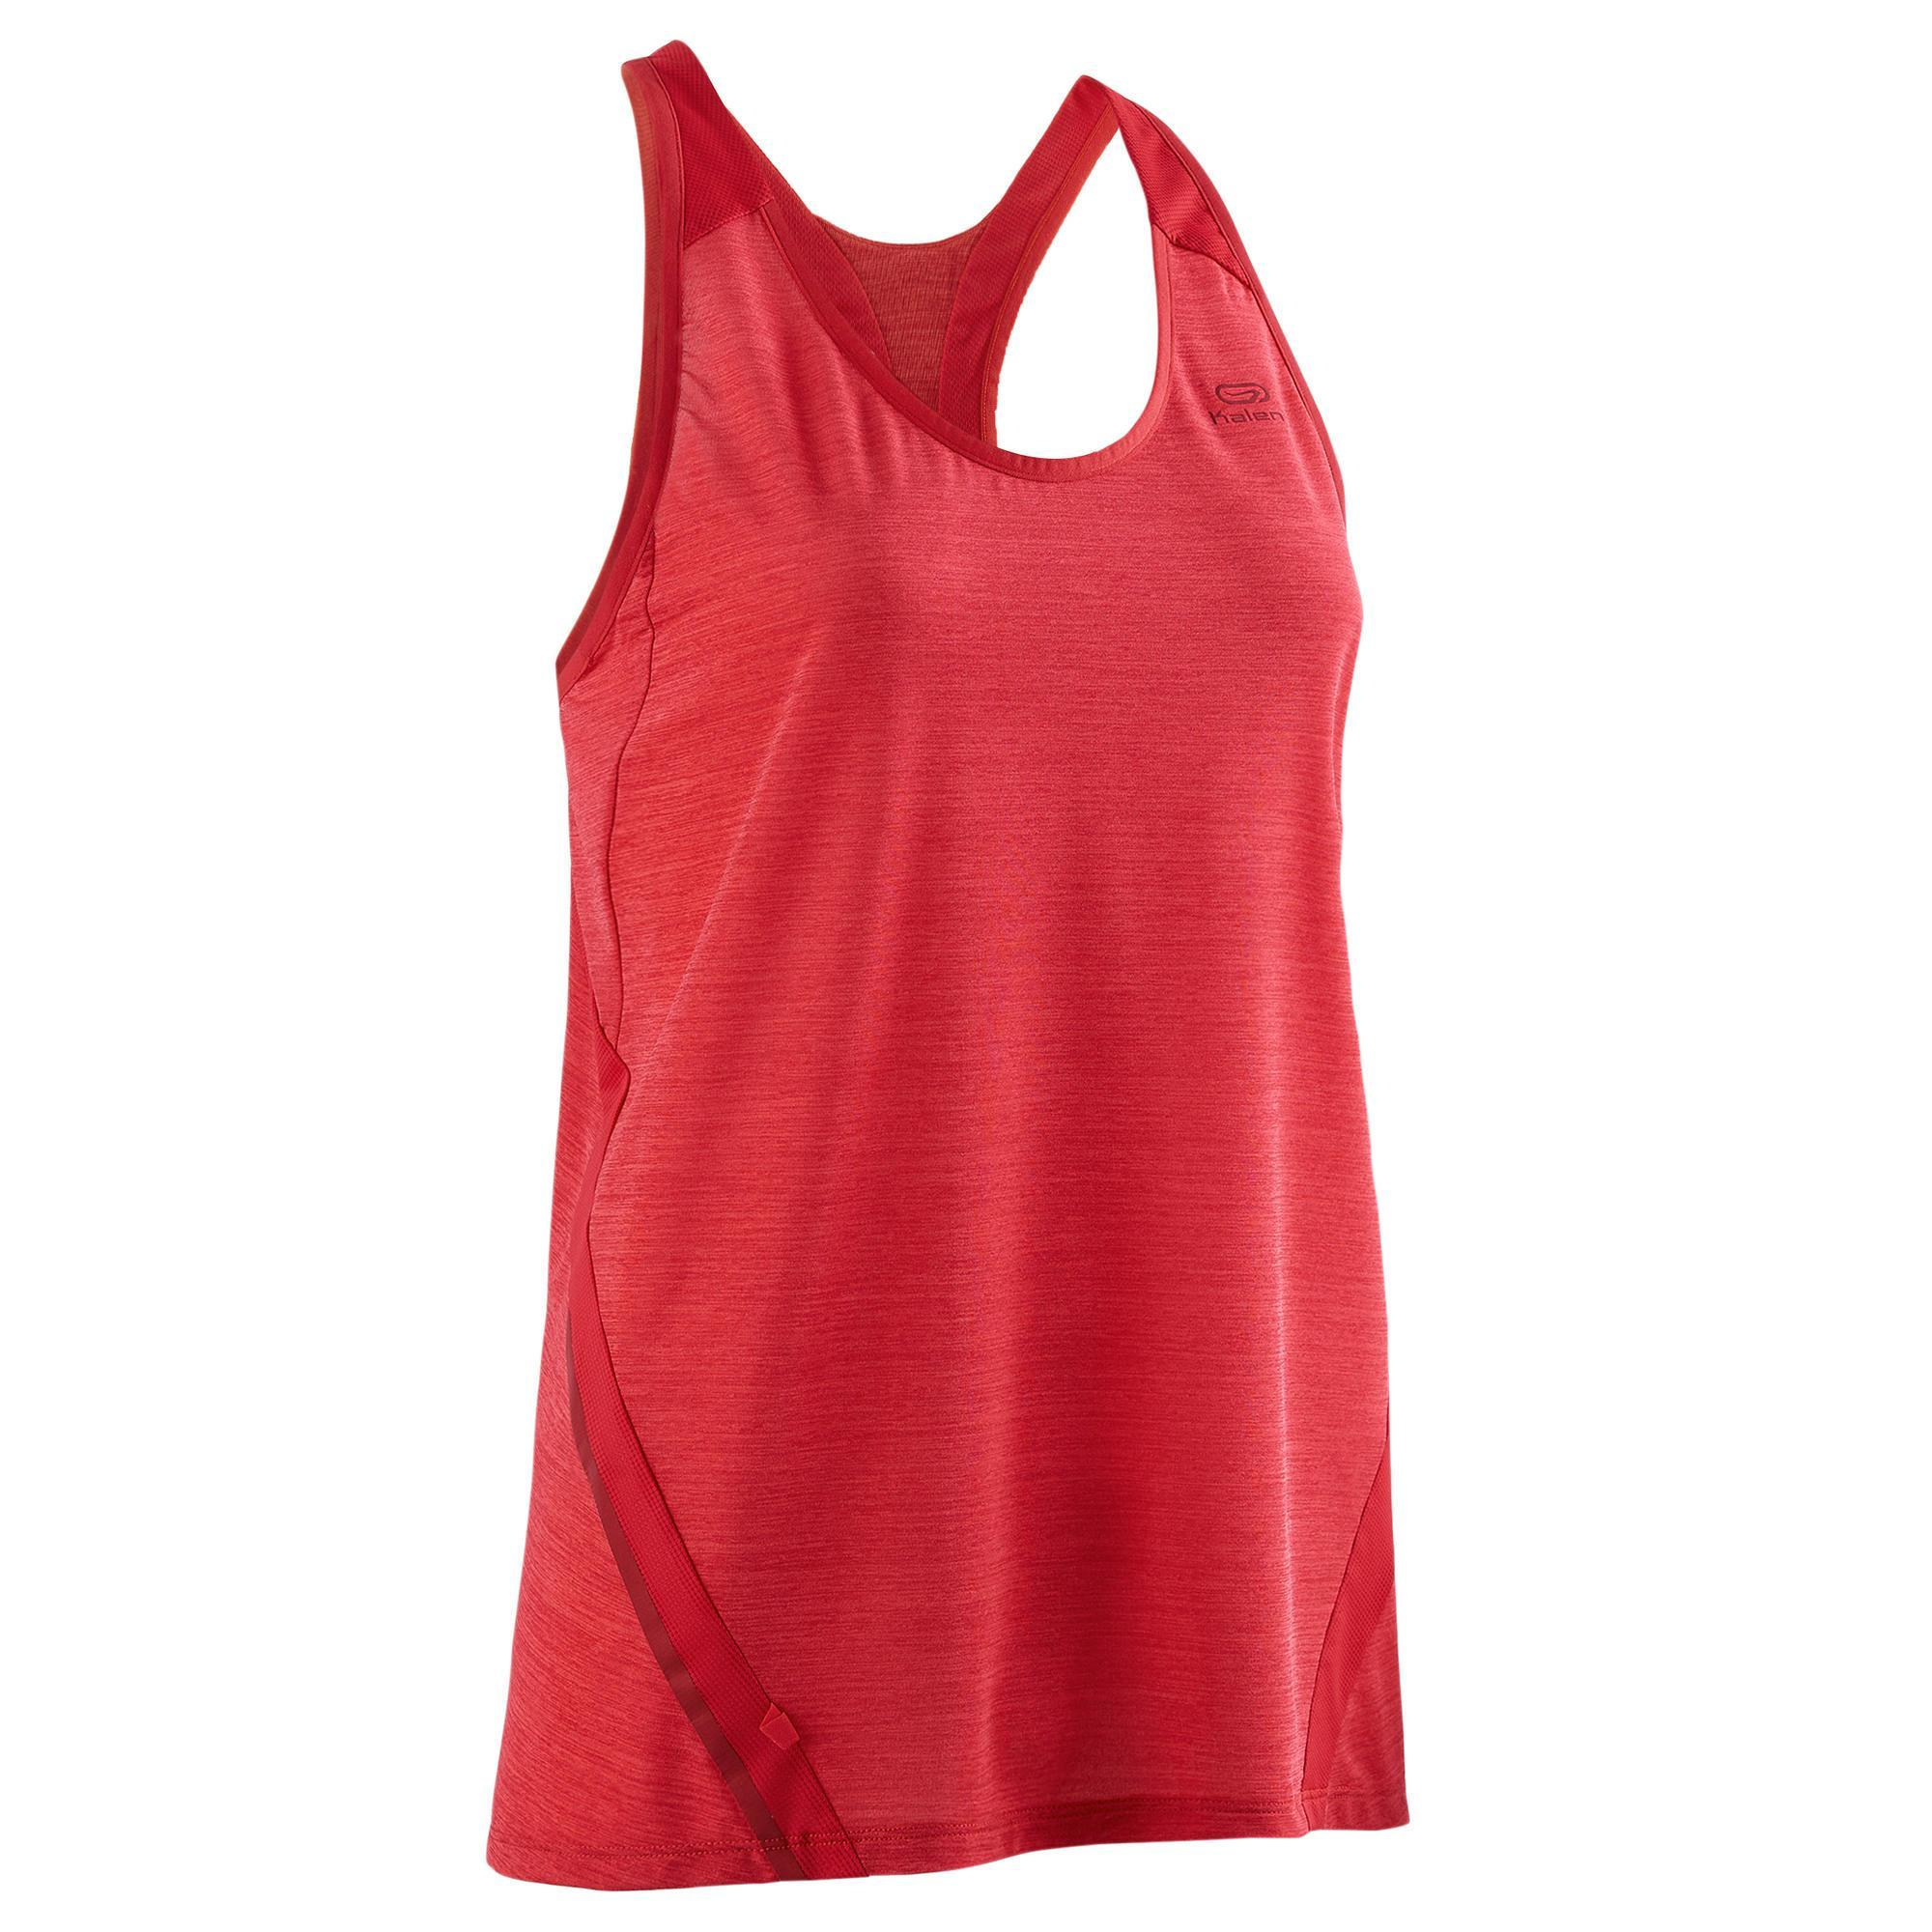 Lauftop Run Light Damen rot | Sportbekleidung > Sporttops | Rot | Baumwolle - Ab | Kalenji